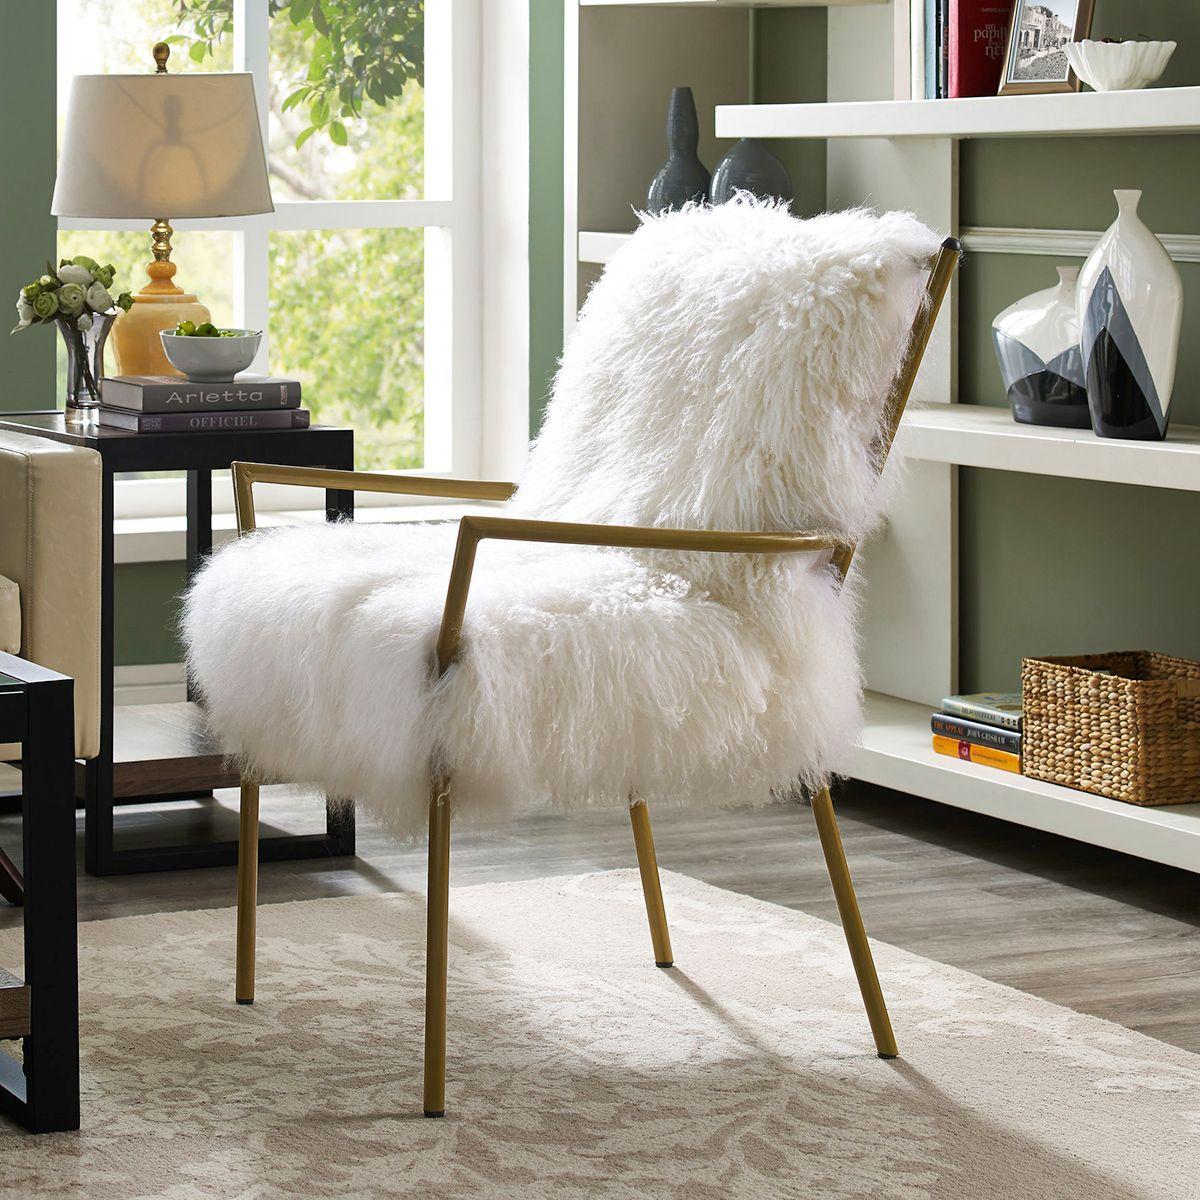 Tov Furniture Lena White Sheepskin Chair On Rose Gold Frame Future Home Pinterest Room